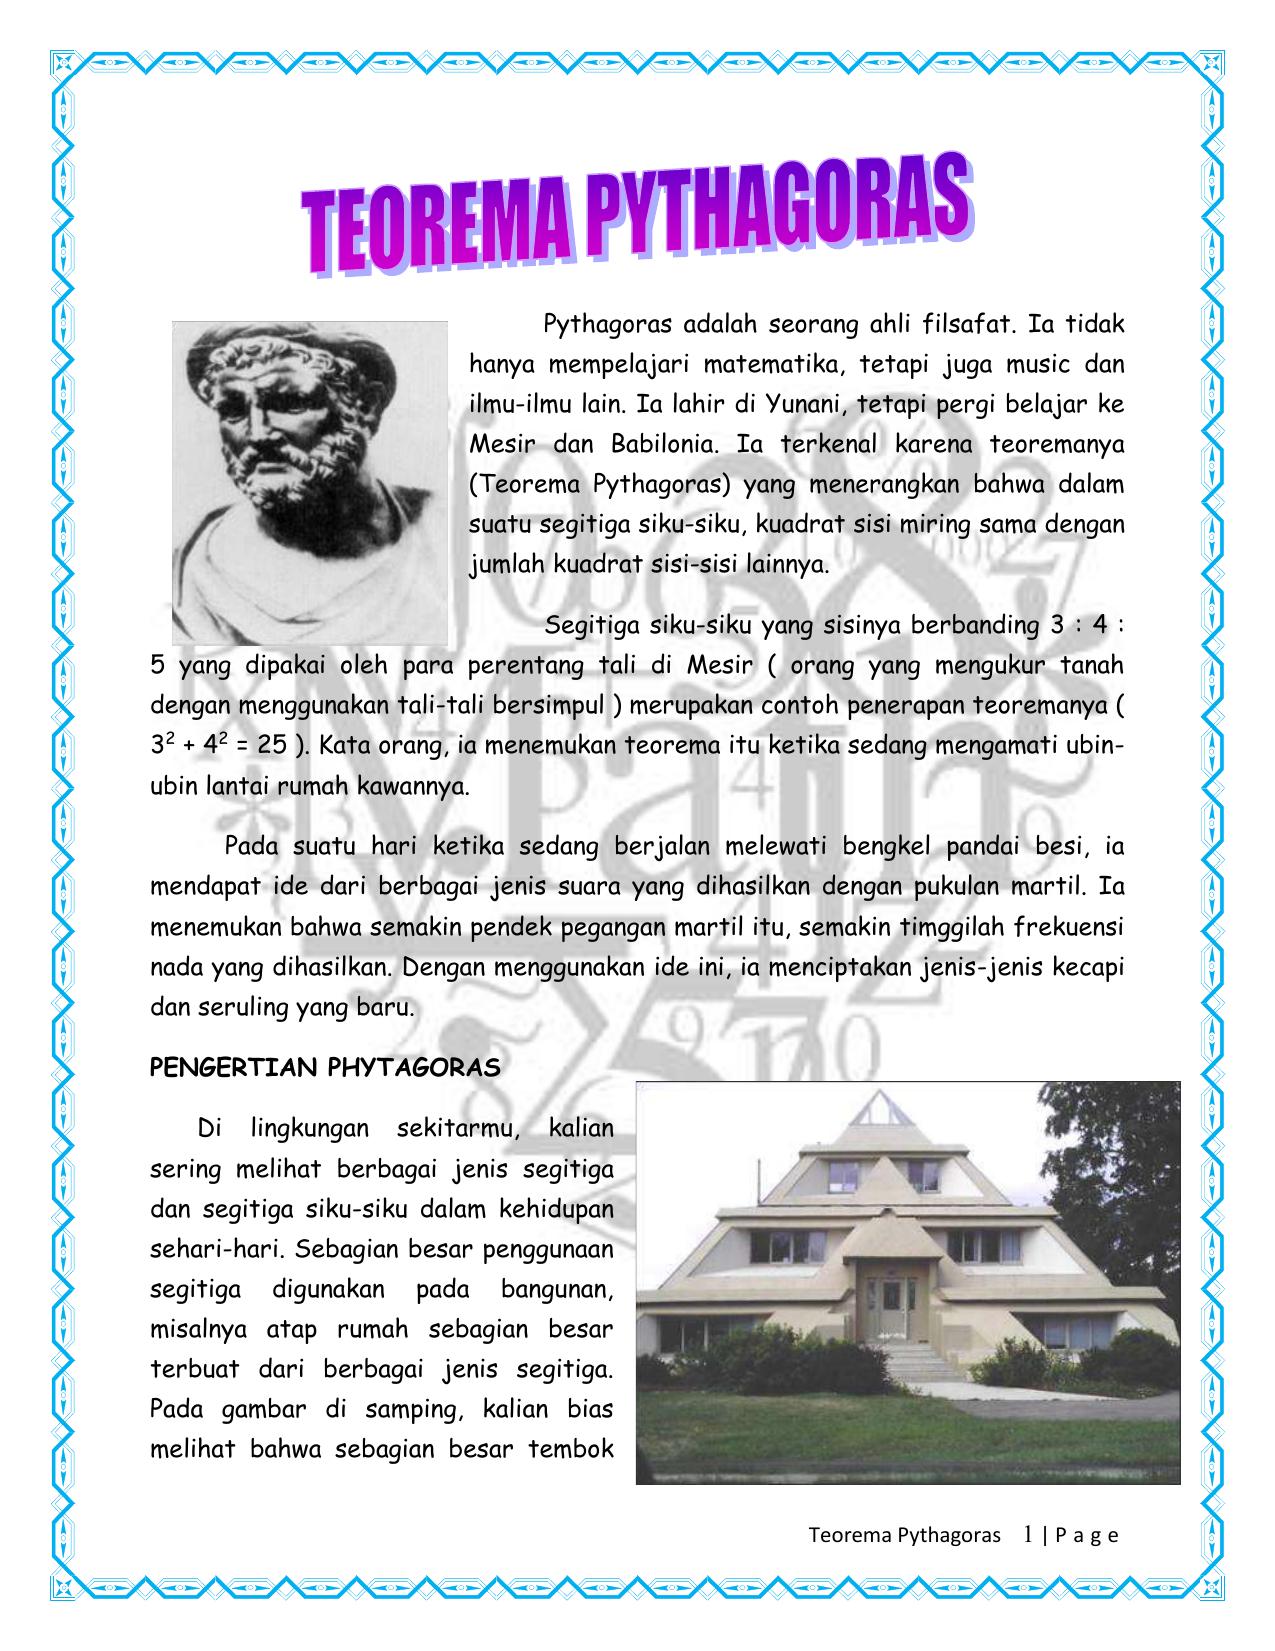 Teorema Pythagoras Pythagoras Adalah Seorang Ahli Filsafat